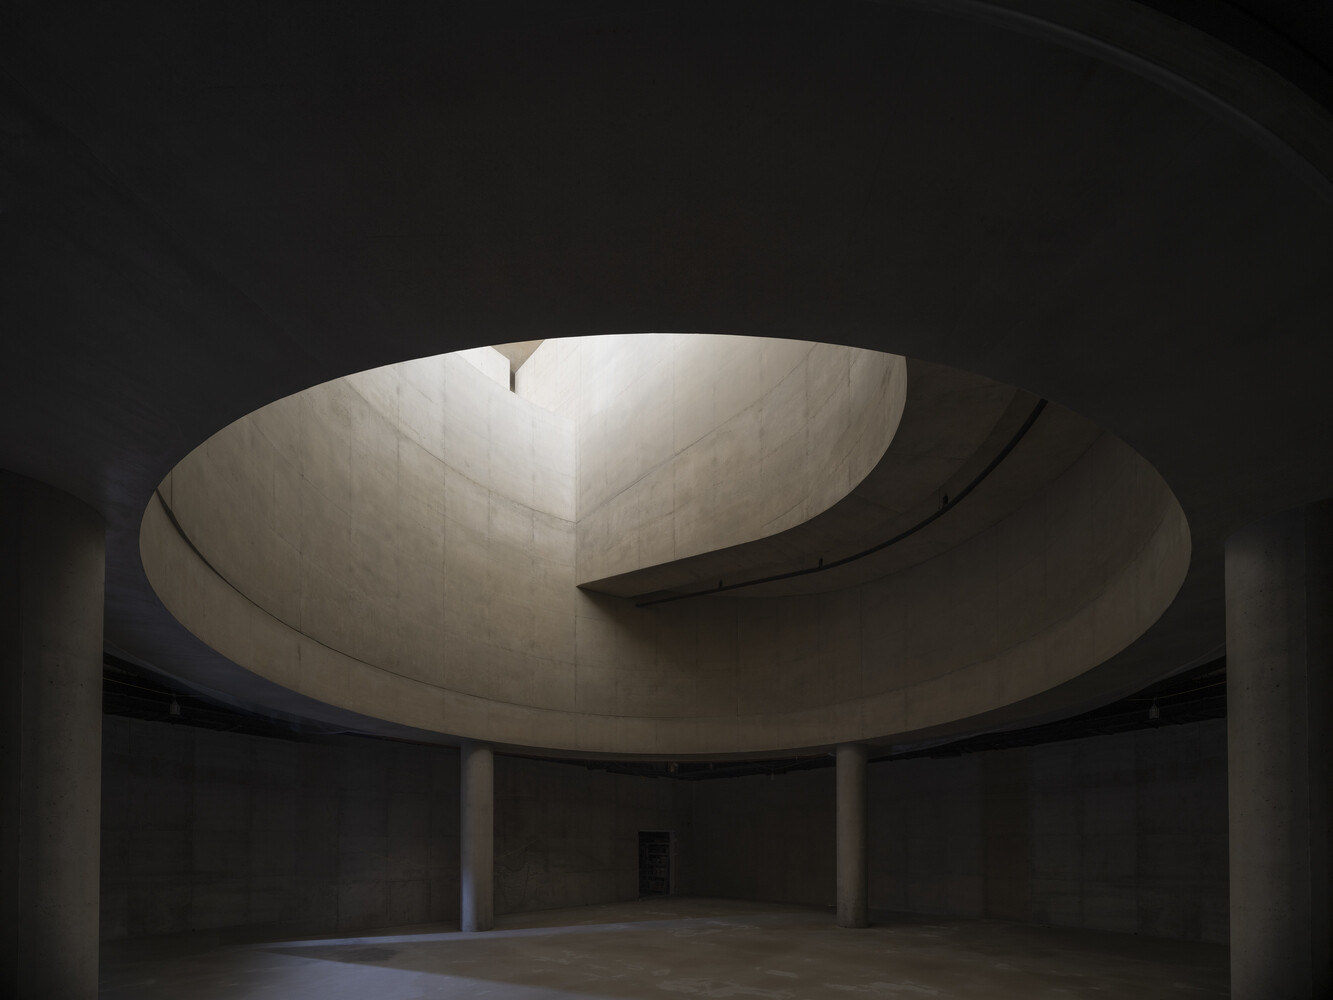 herzog-de-meuron-completan-el-songeun-art-space-en-corea-del-sur